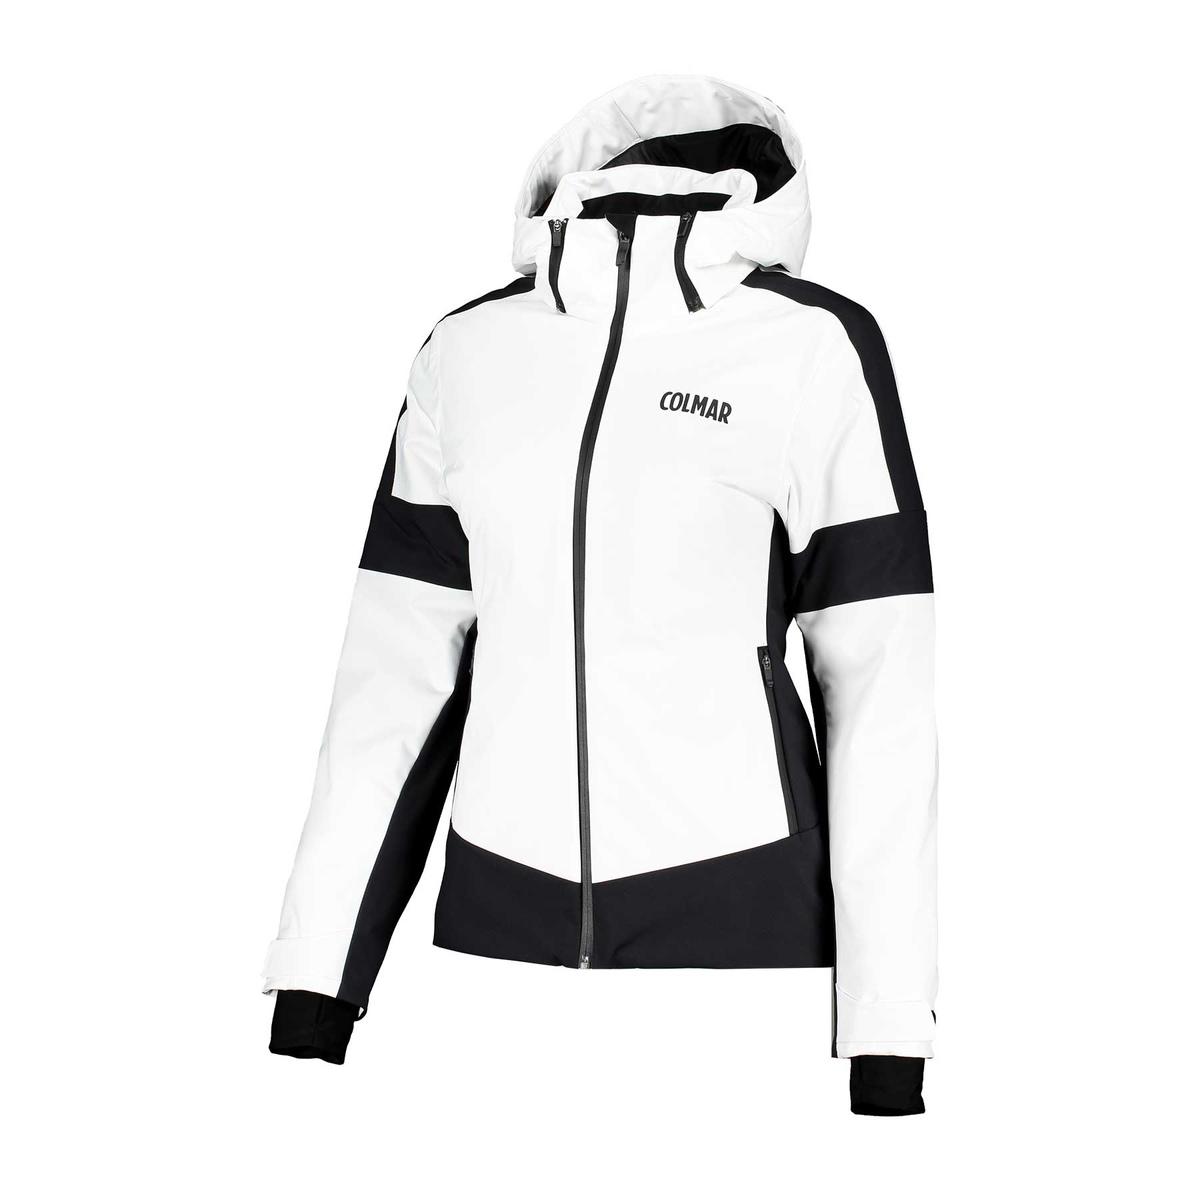 Prezzi Colmar giacca iceland donna